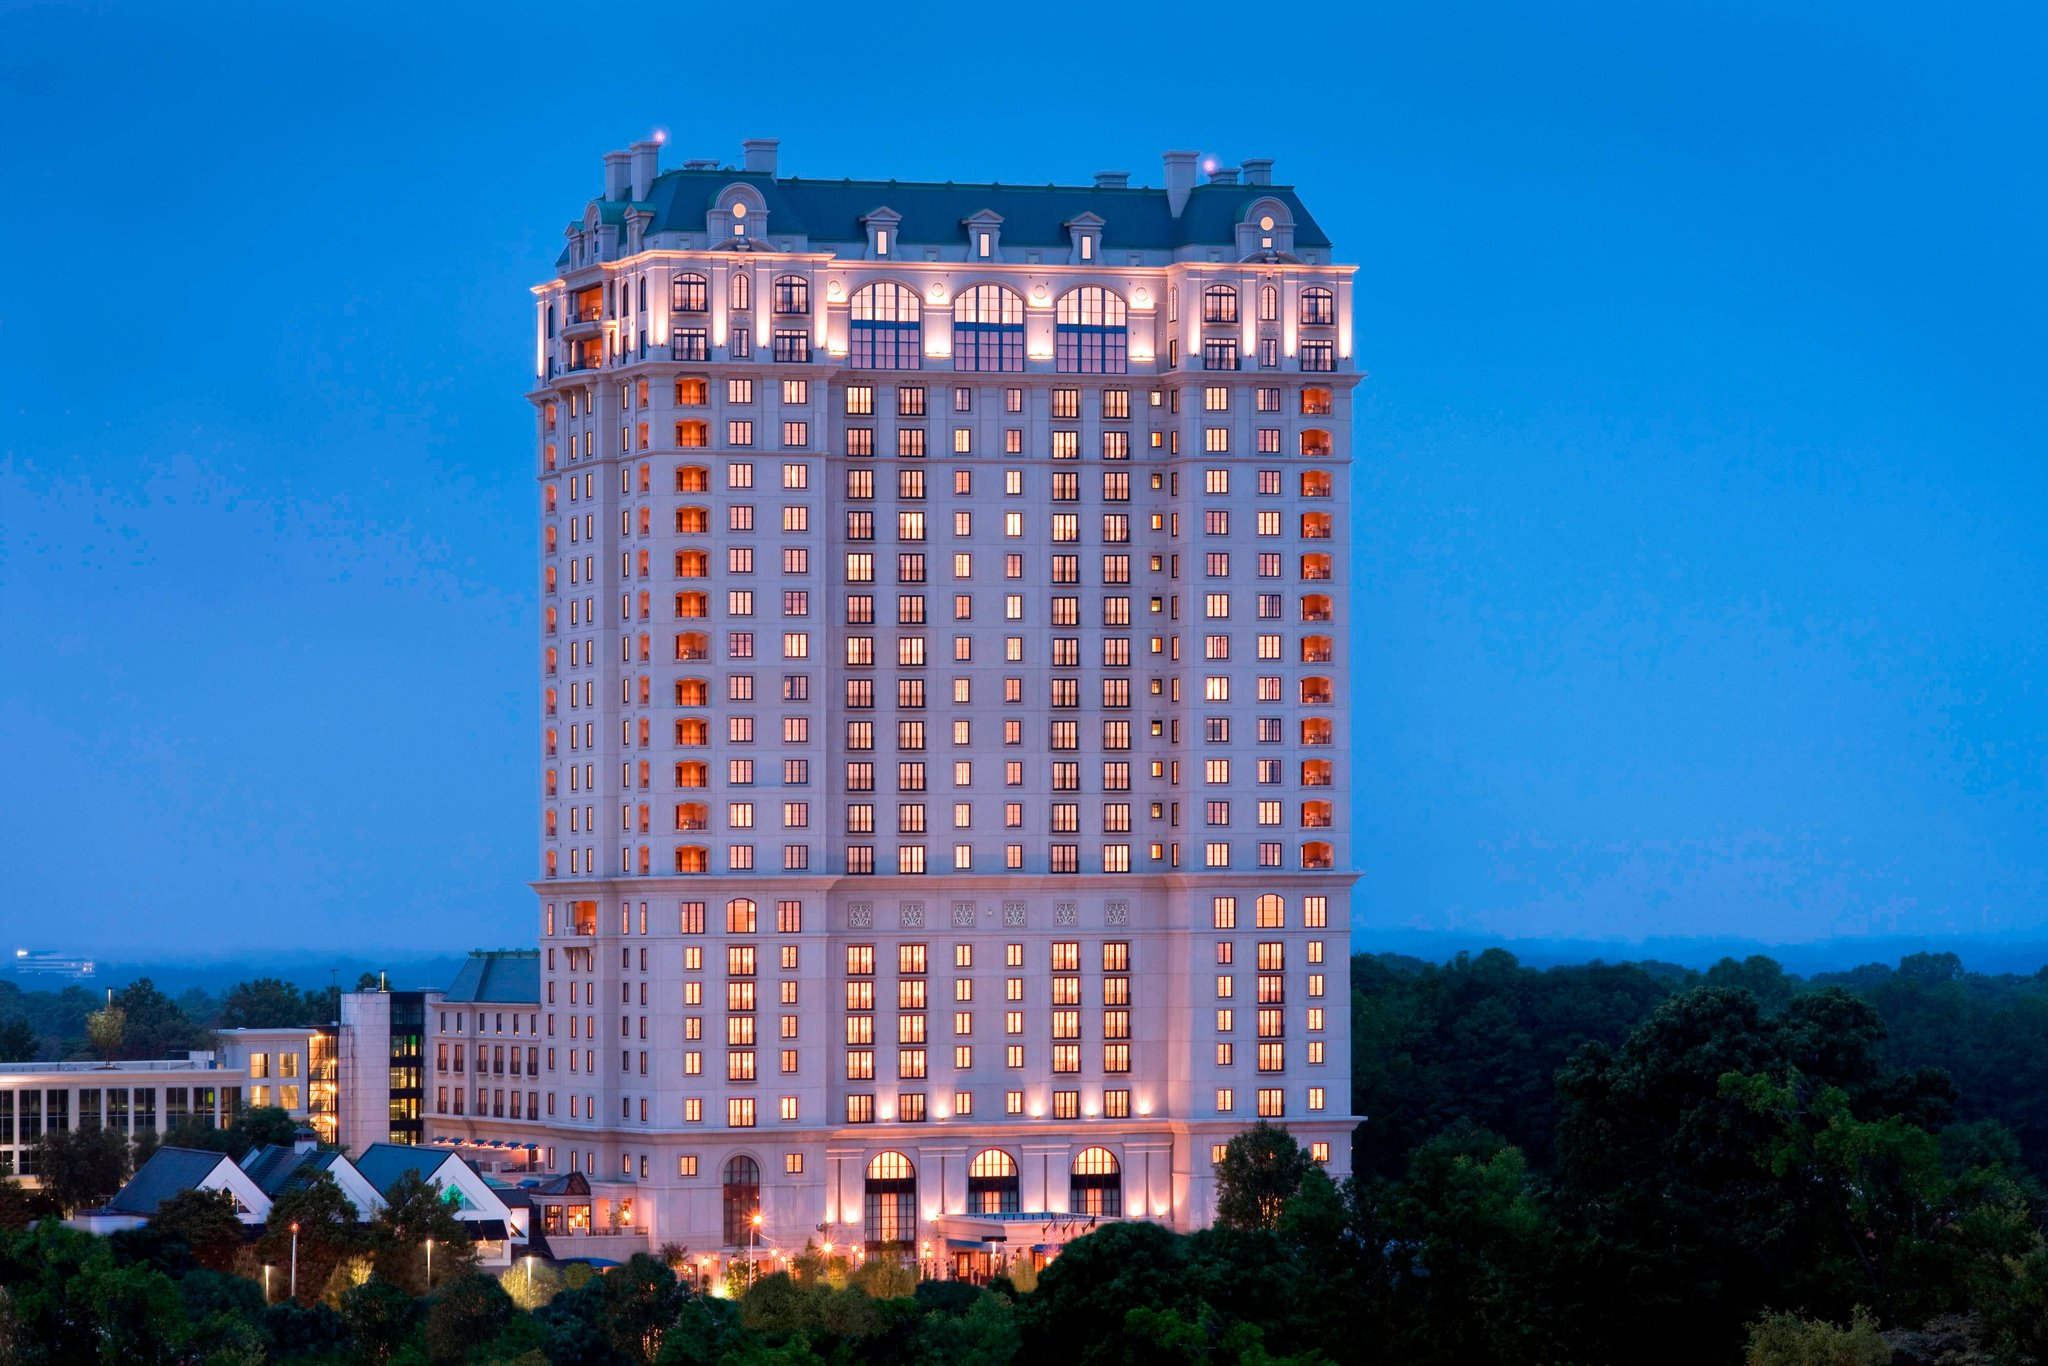 The St Regis Atlanta